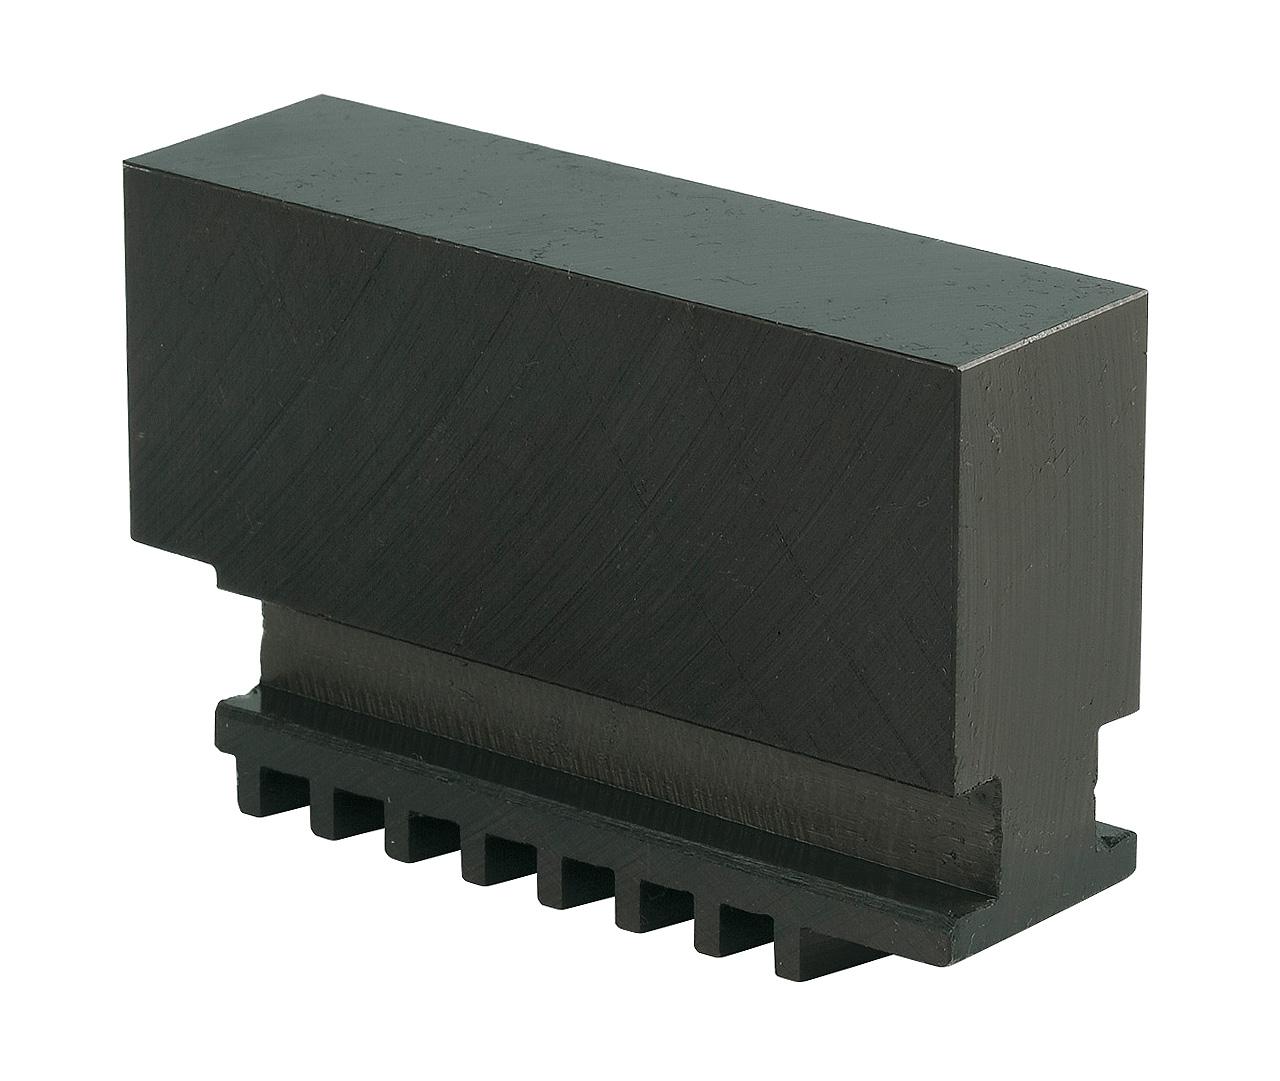 Szczęki jednolite miękkie - komplet SJ-PS4-630 BERNARDO